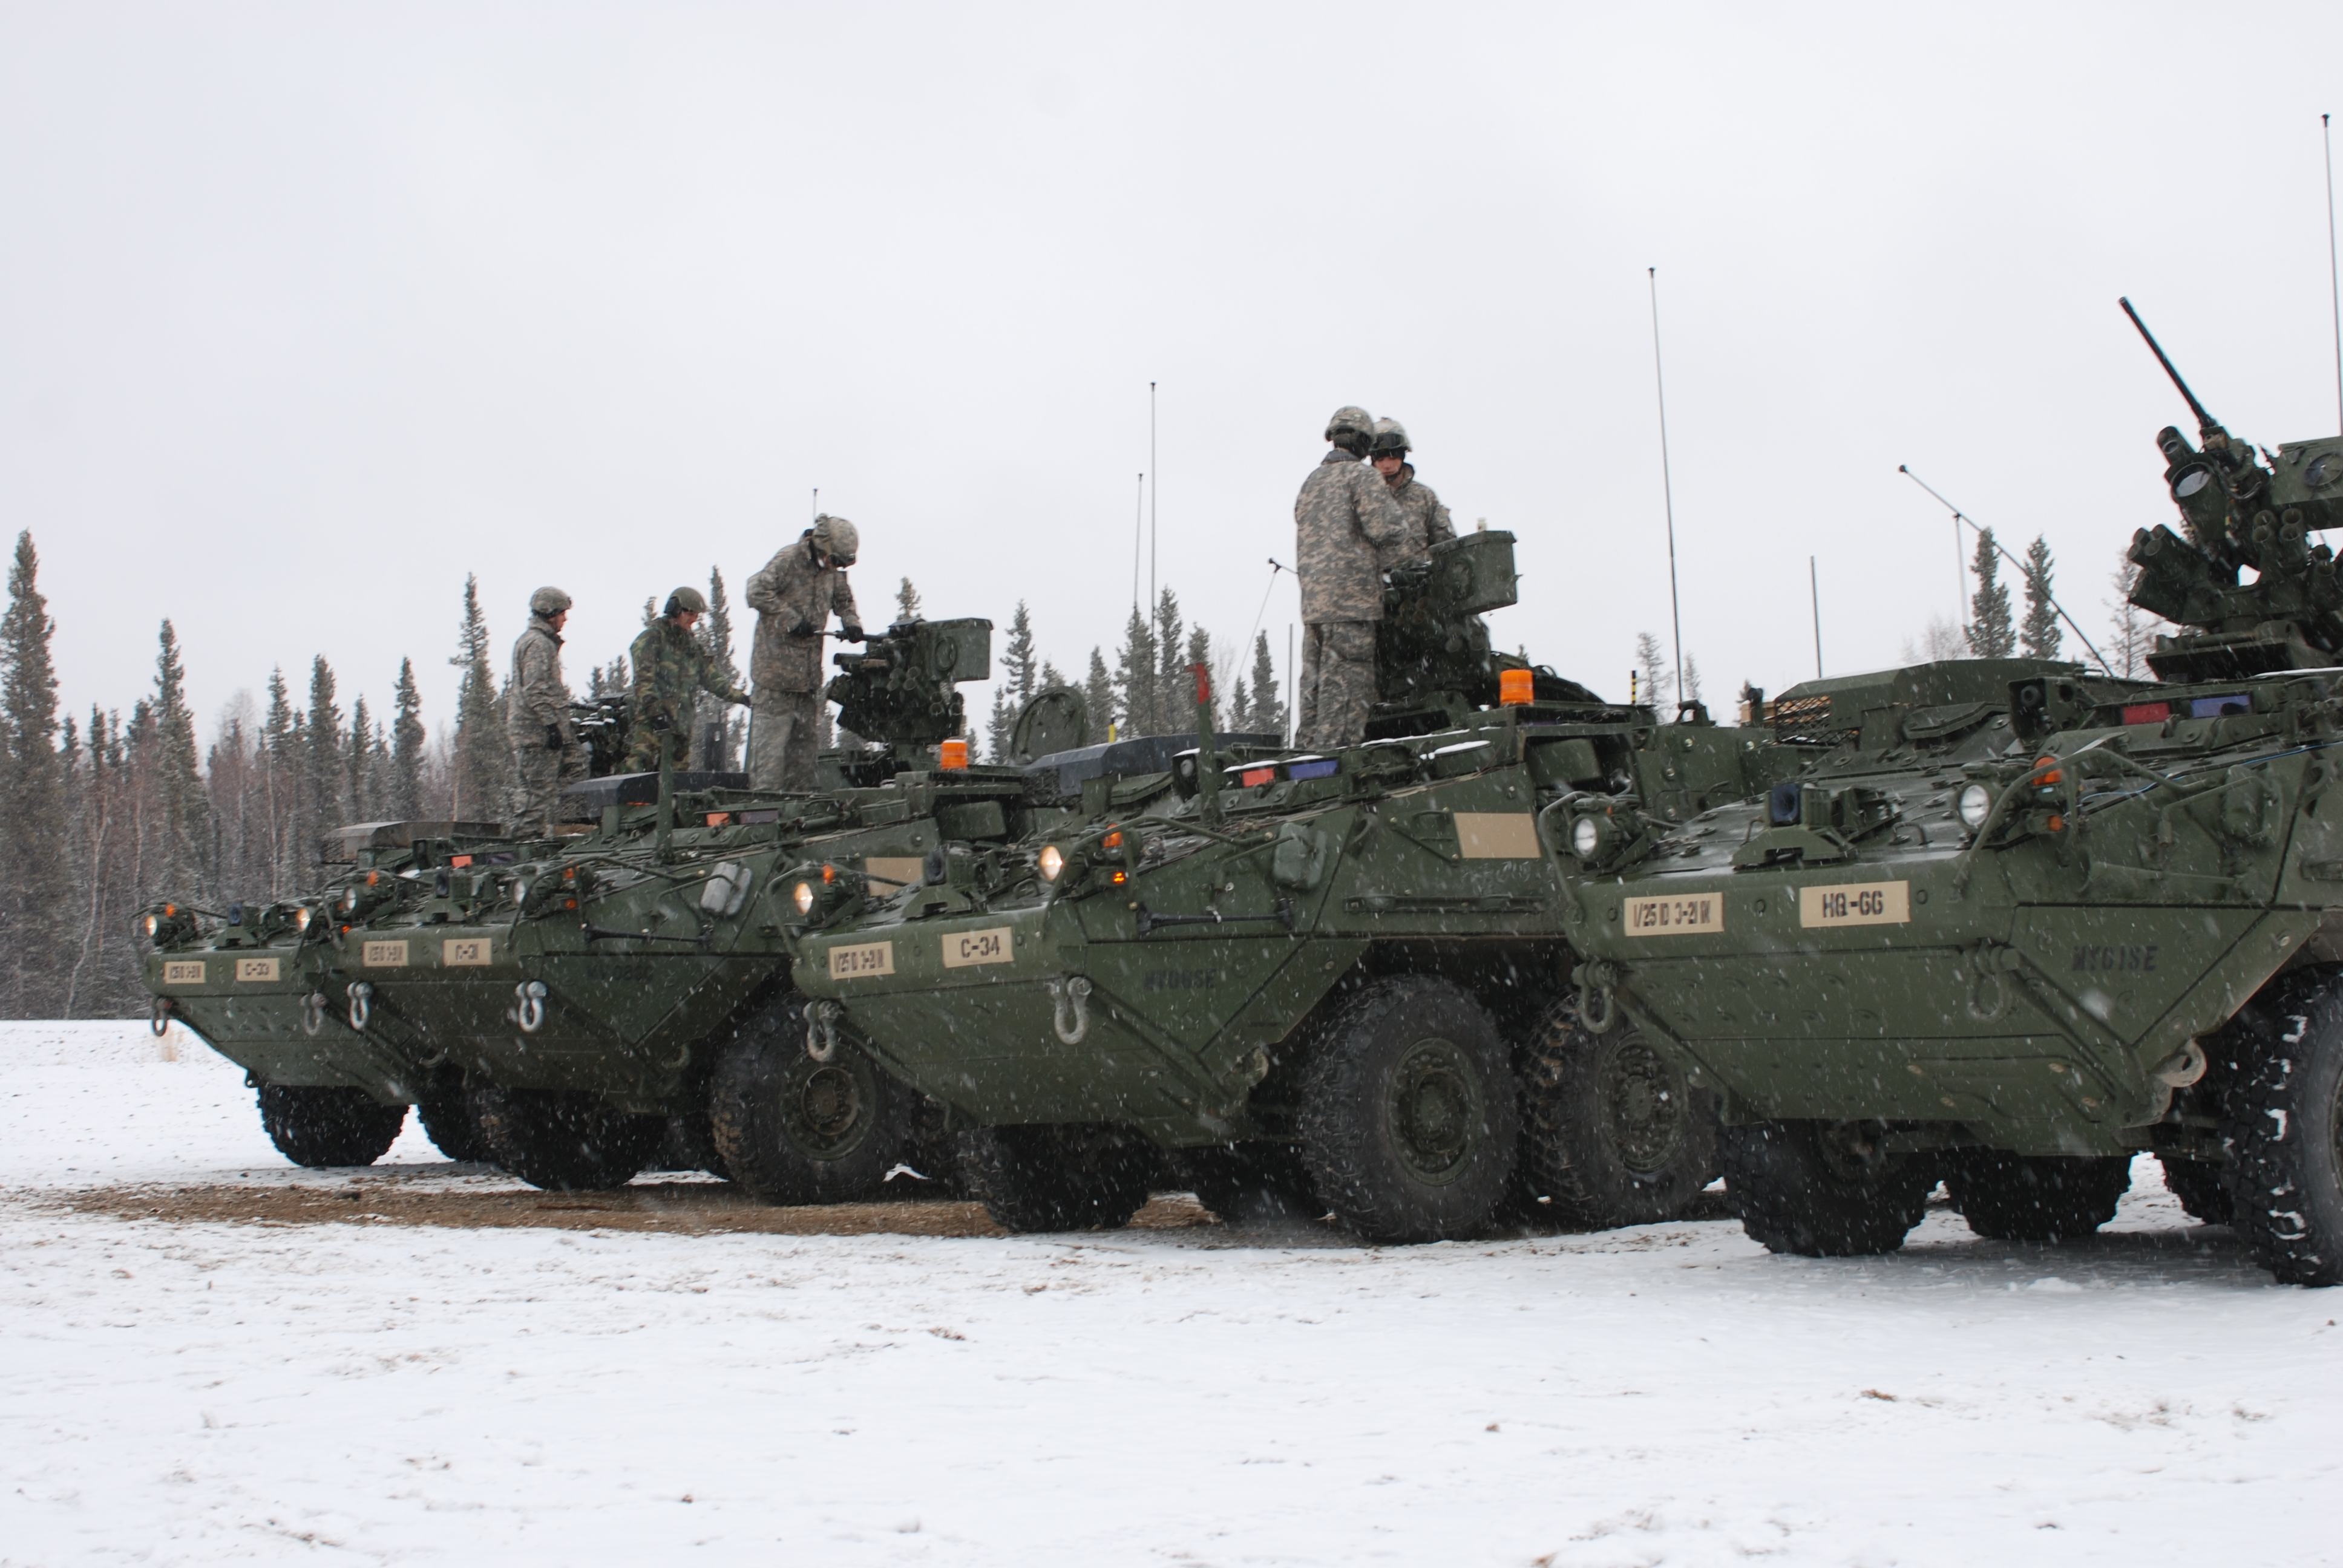 Fort_Greely%2C_Alaska%2C_100414-A-7500C-